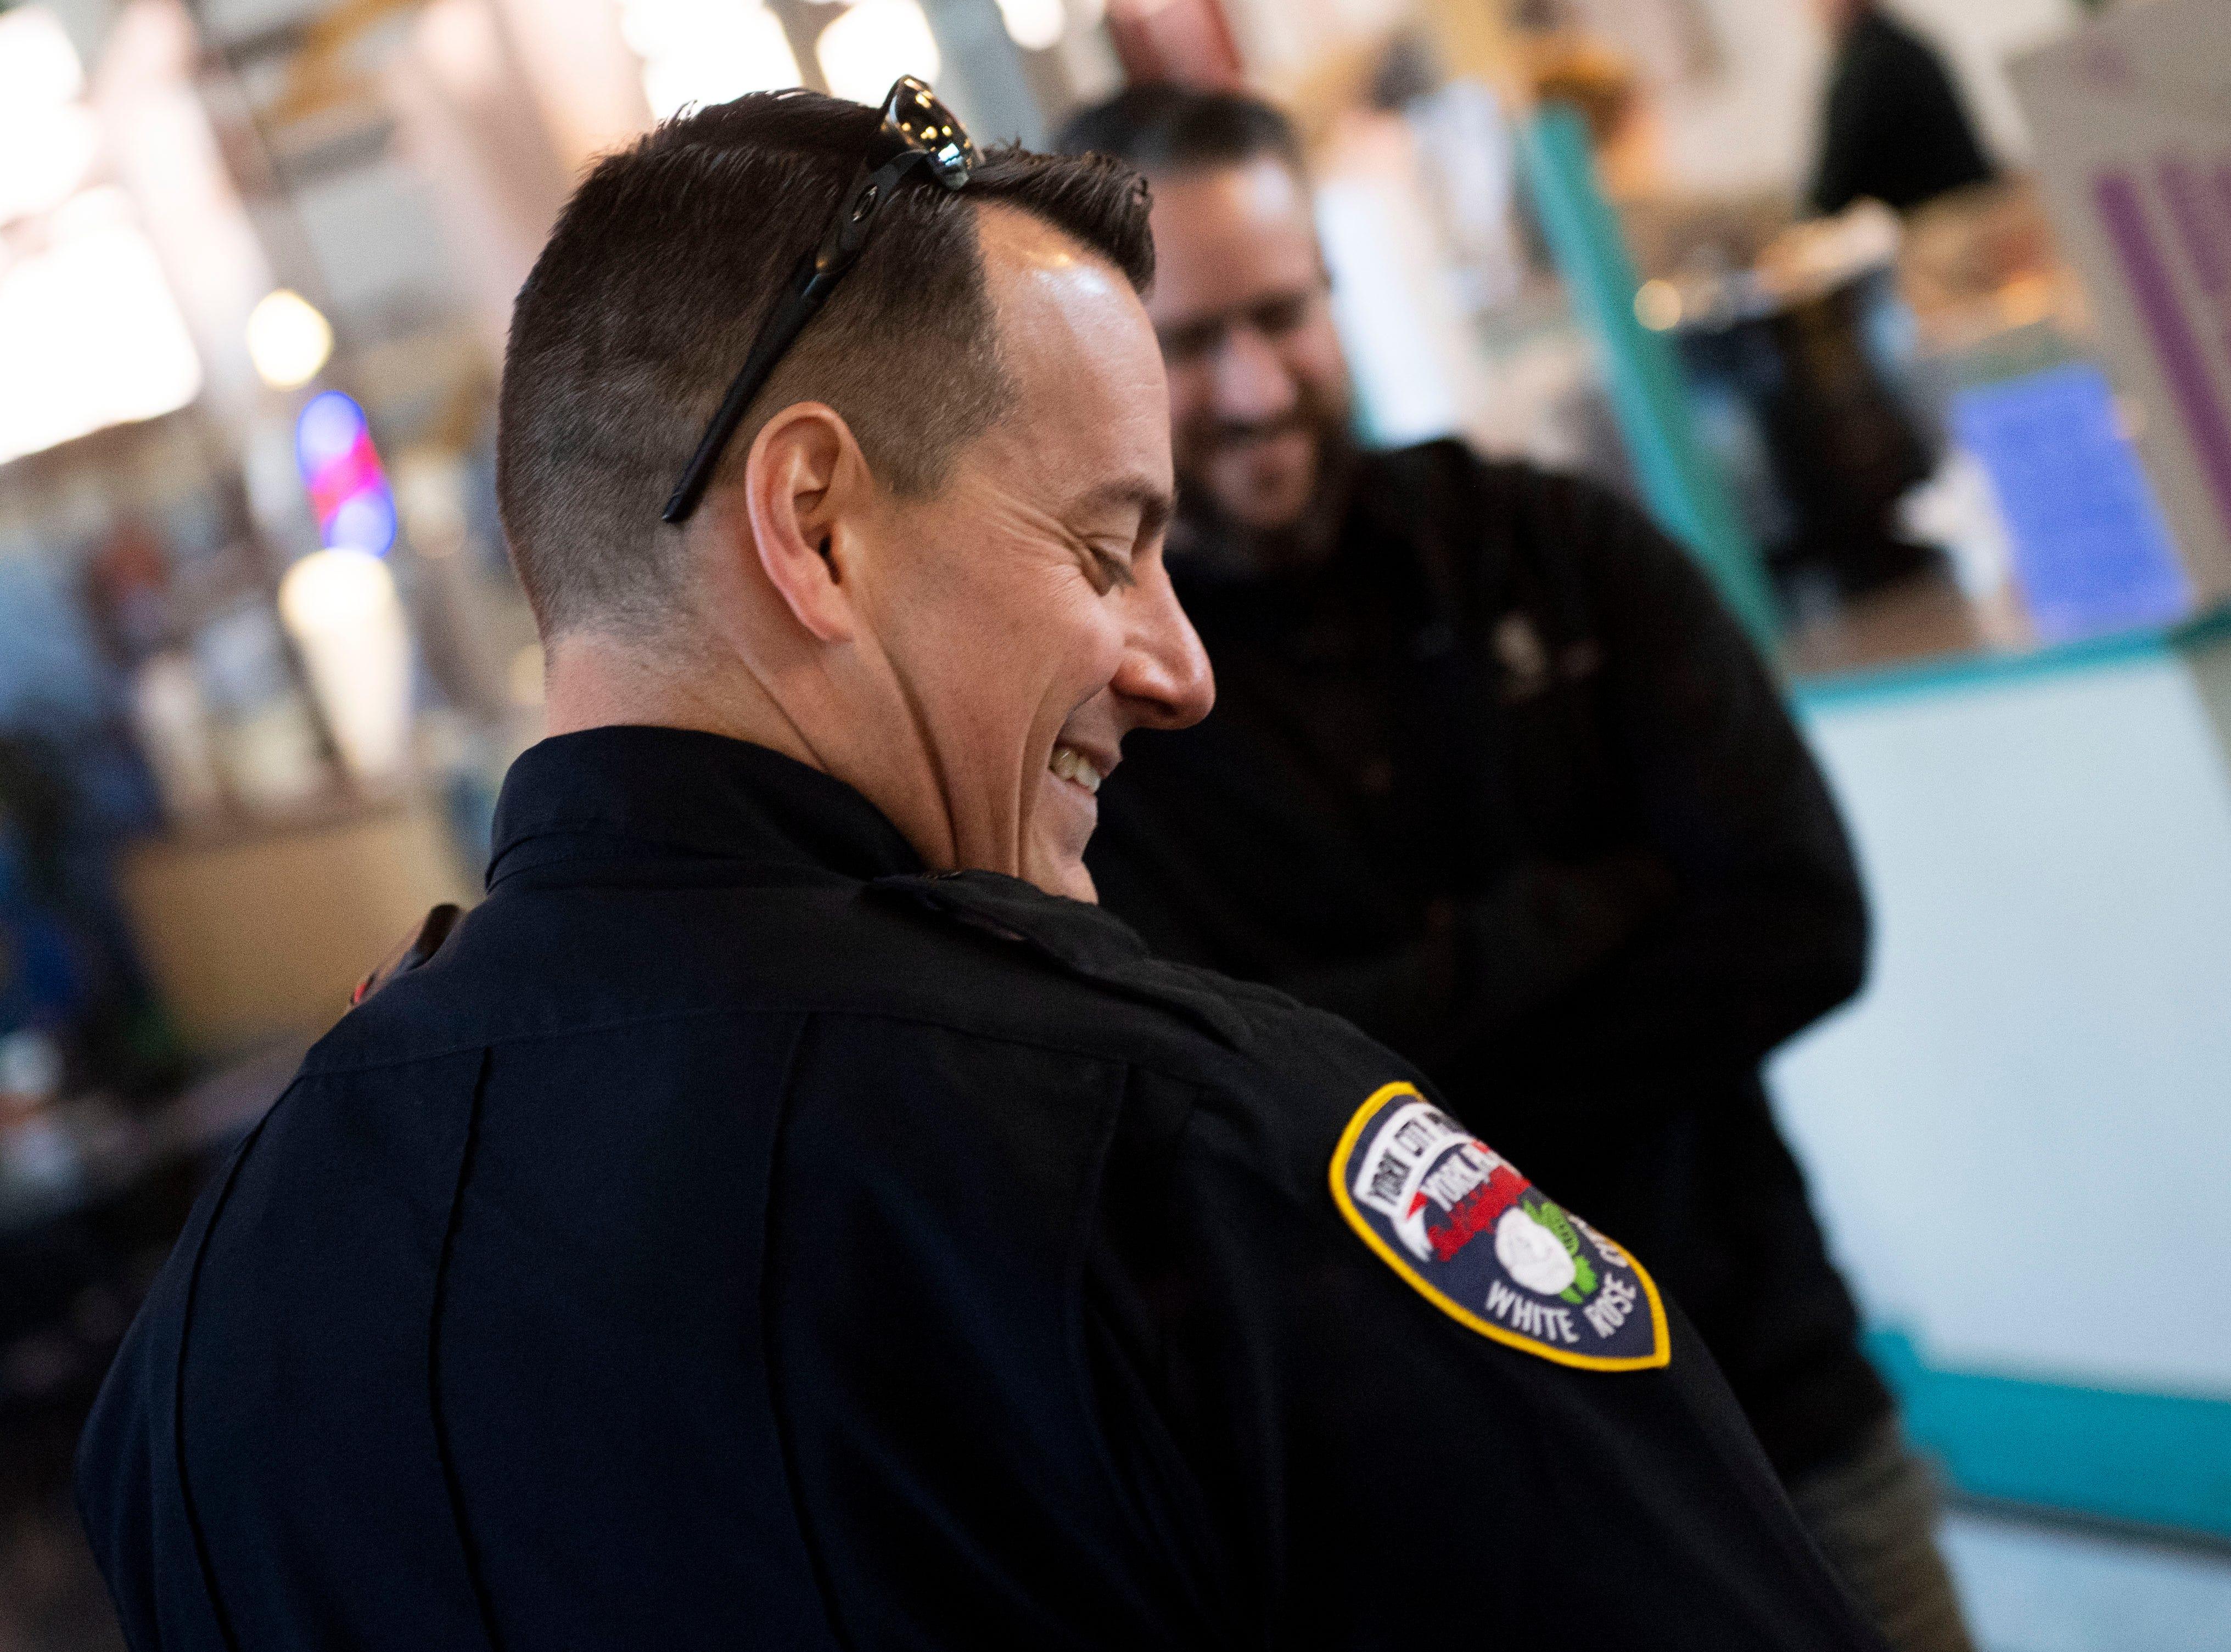 York City police officer Derek Hartman looks down at the 'Loomo' robot in Central Market, Thursday, Nov. 8, 2018.